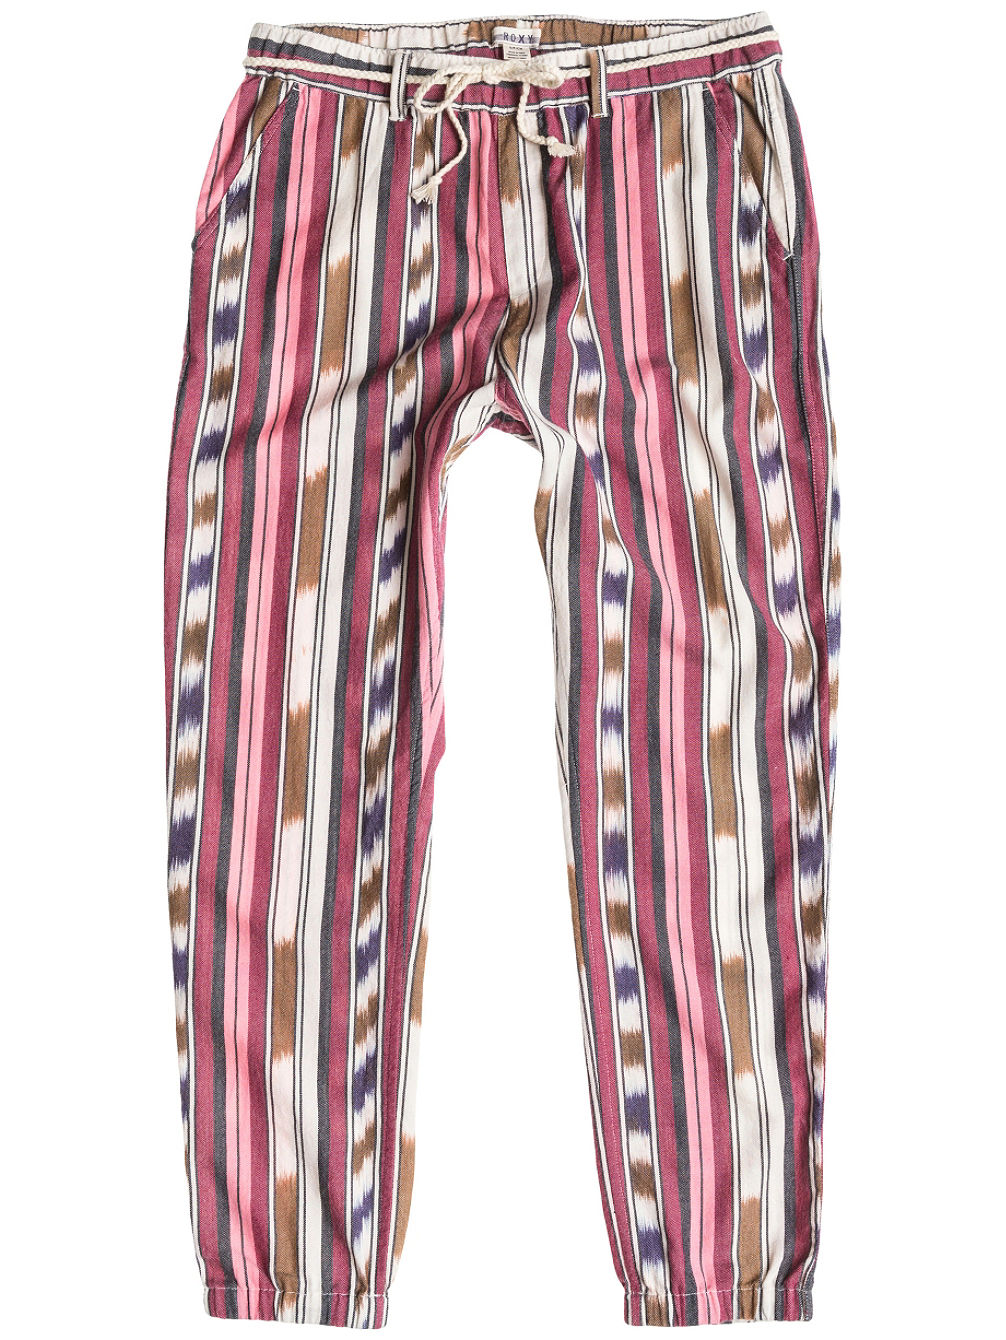 beachy-beach-chambray-pants